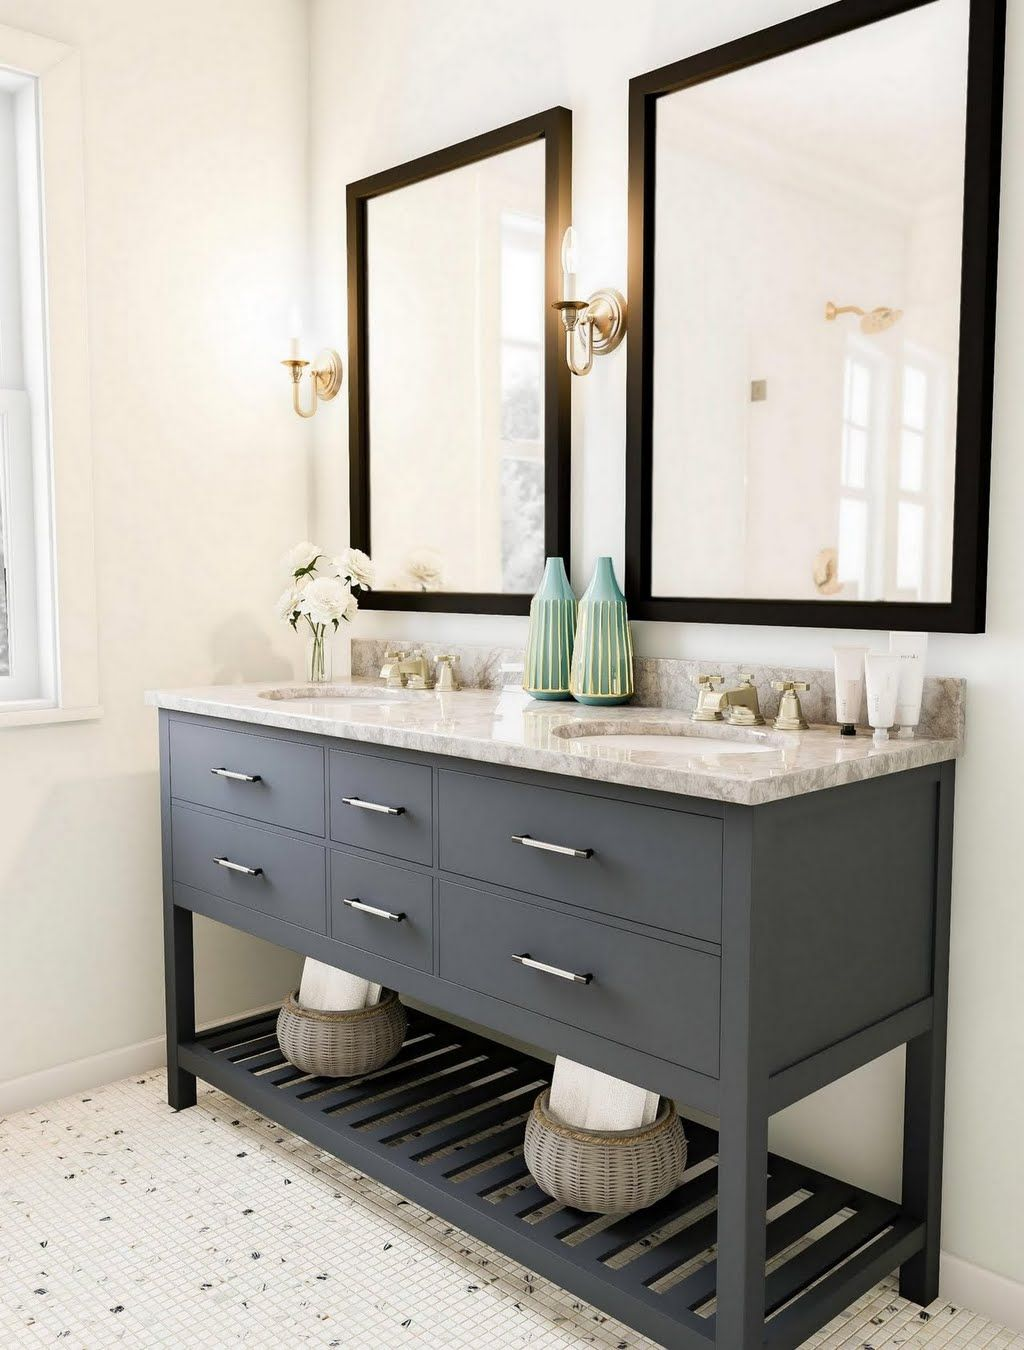 Shop Our Bathroom Department To Customize Your Dual Bathroom Sinks With Pub Mirrors Bathroom Vanity Decor Farmhouse Bathroom Vanity Home Depot Bathroom Vanity [ 1350 x 1024 Pixel ]